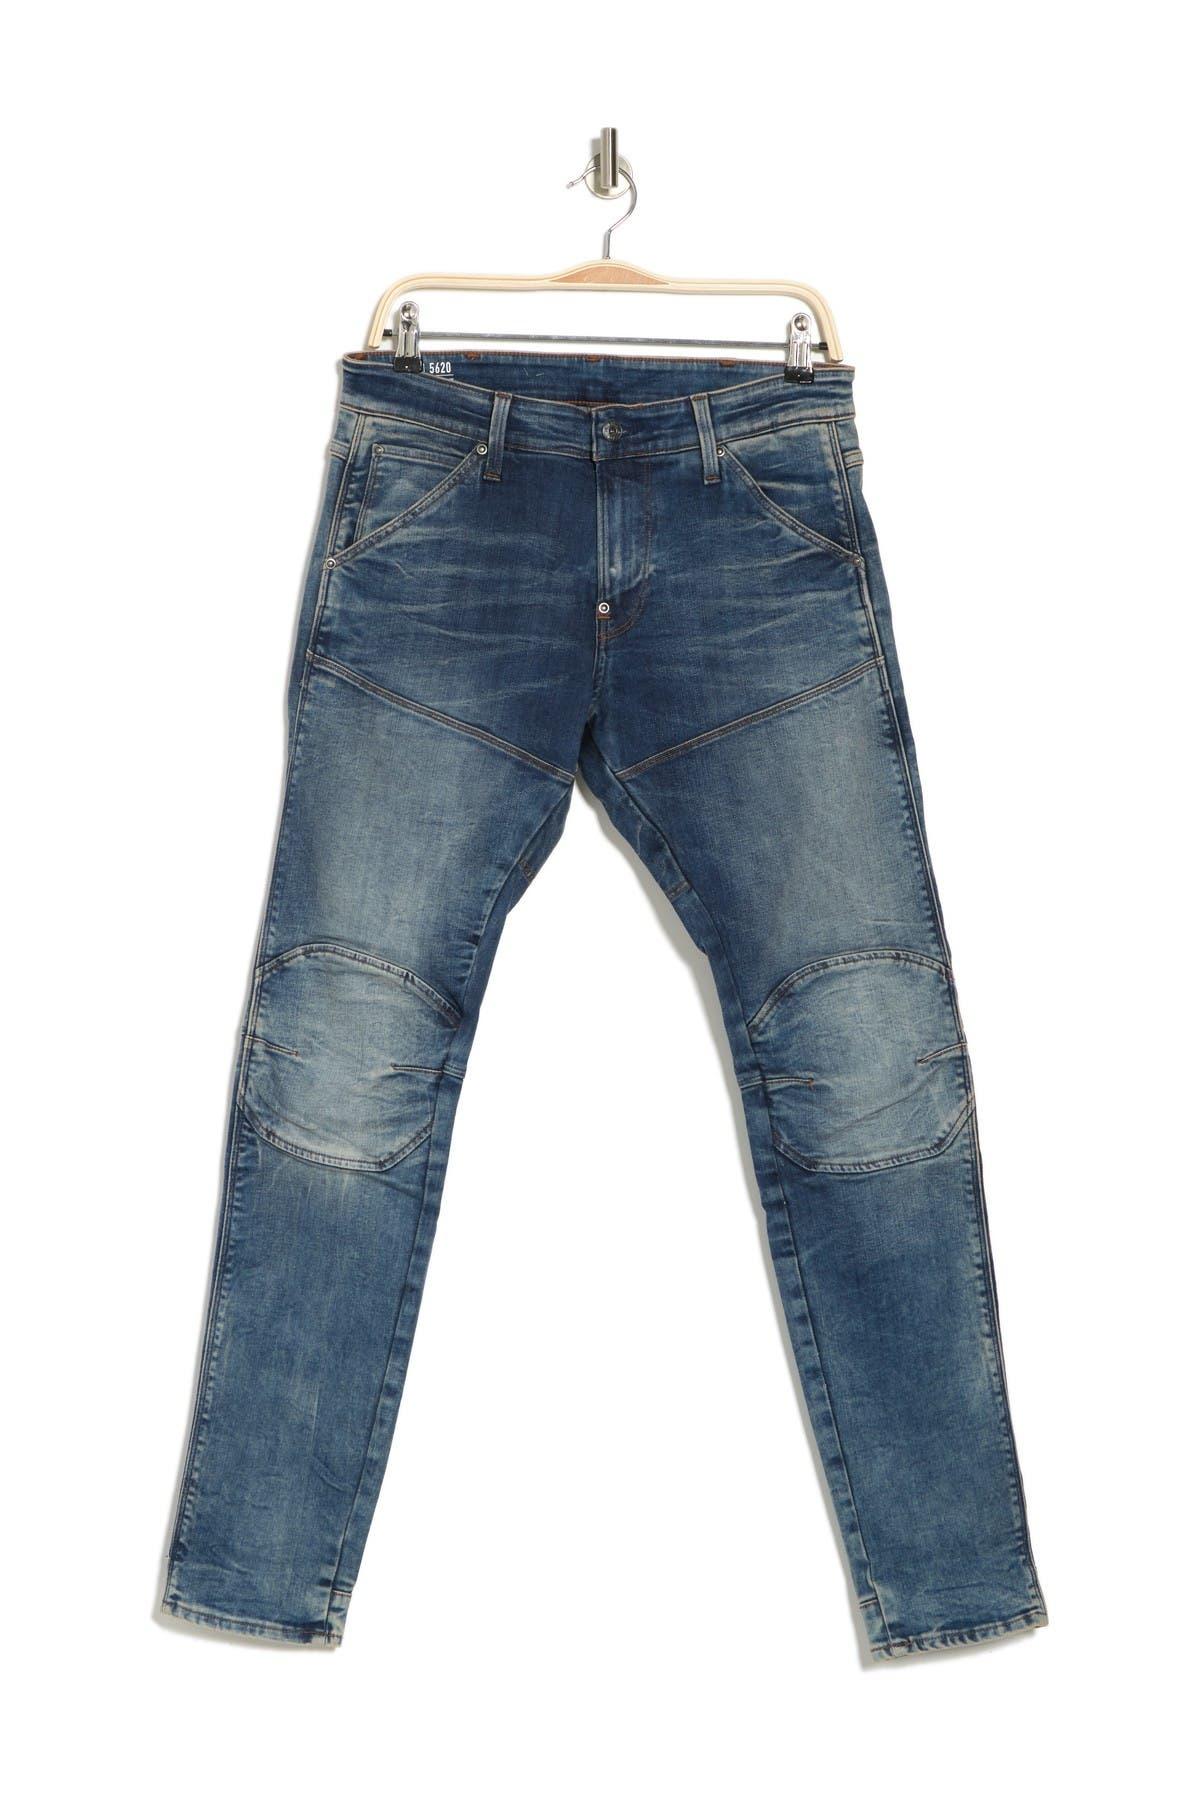 Image of G-STAR RAW 5620 Elwood Skinny Jeans